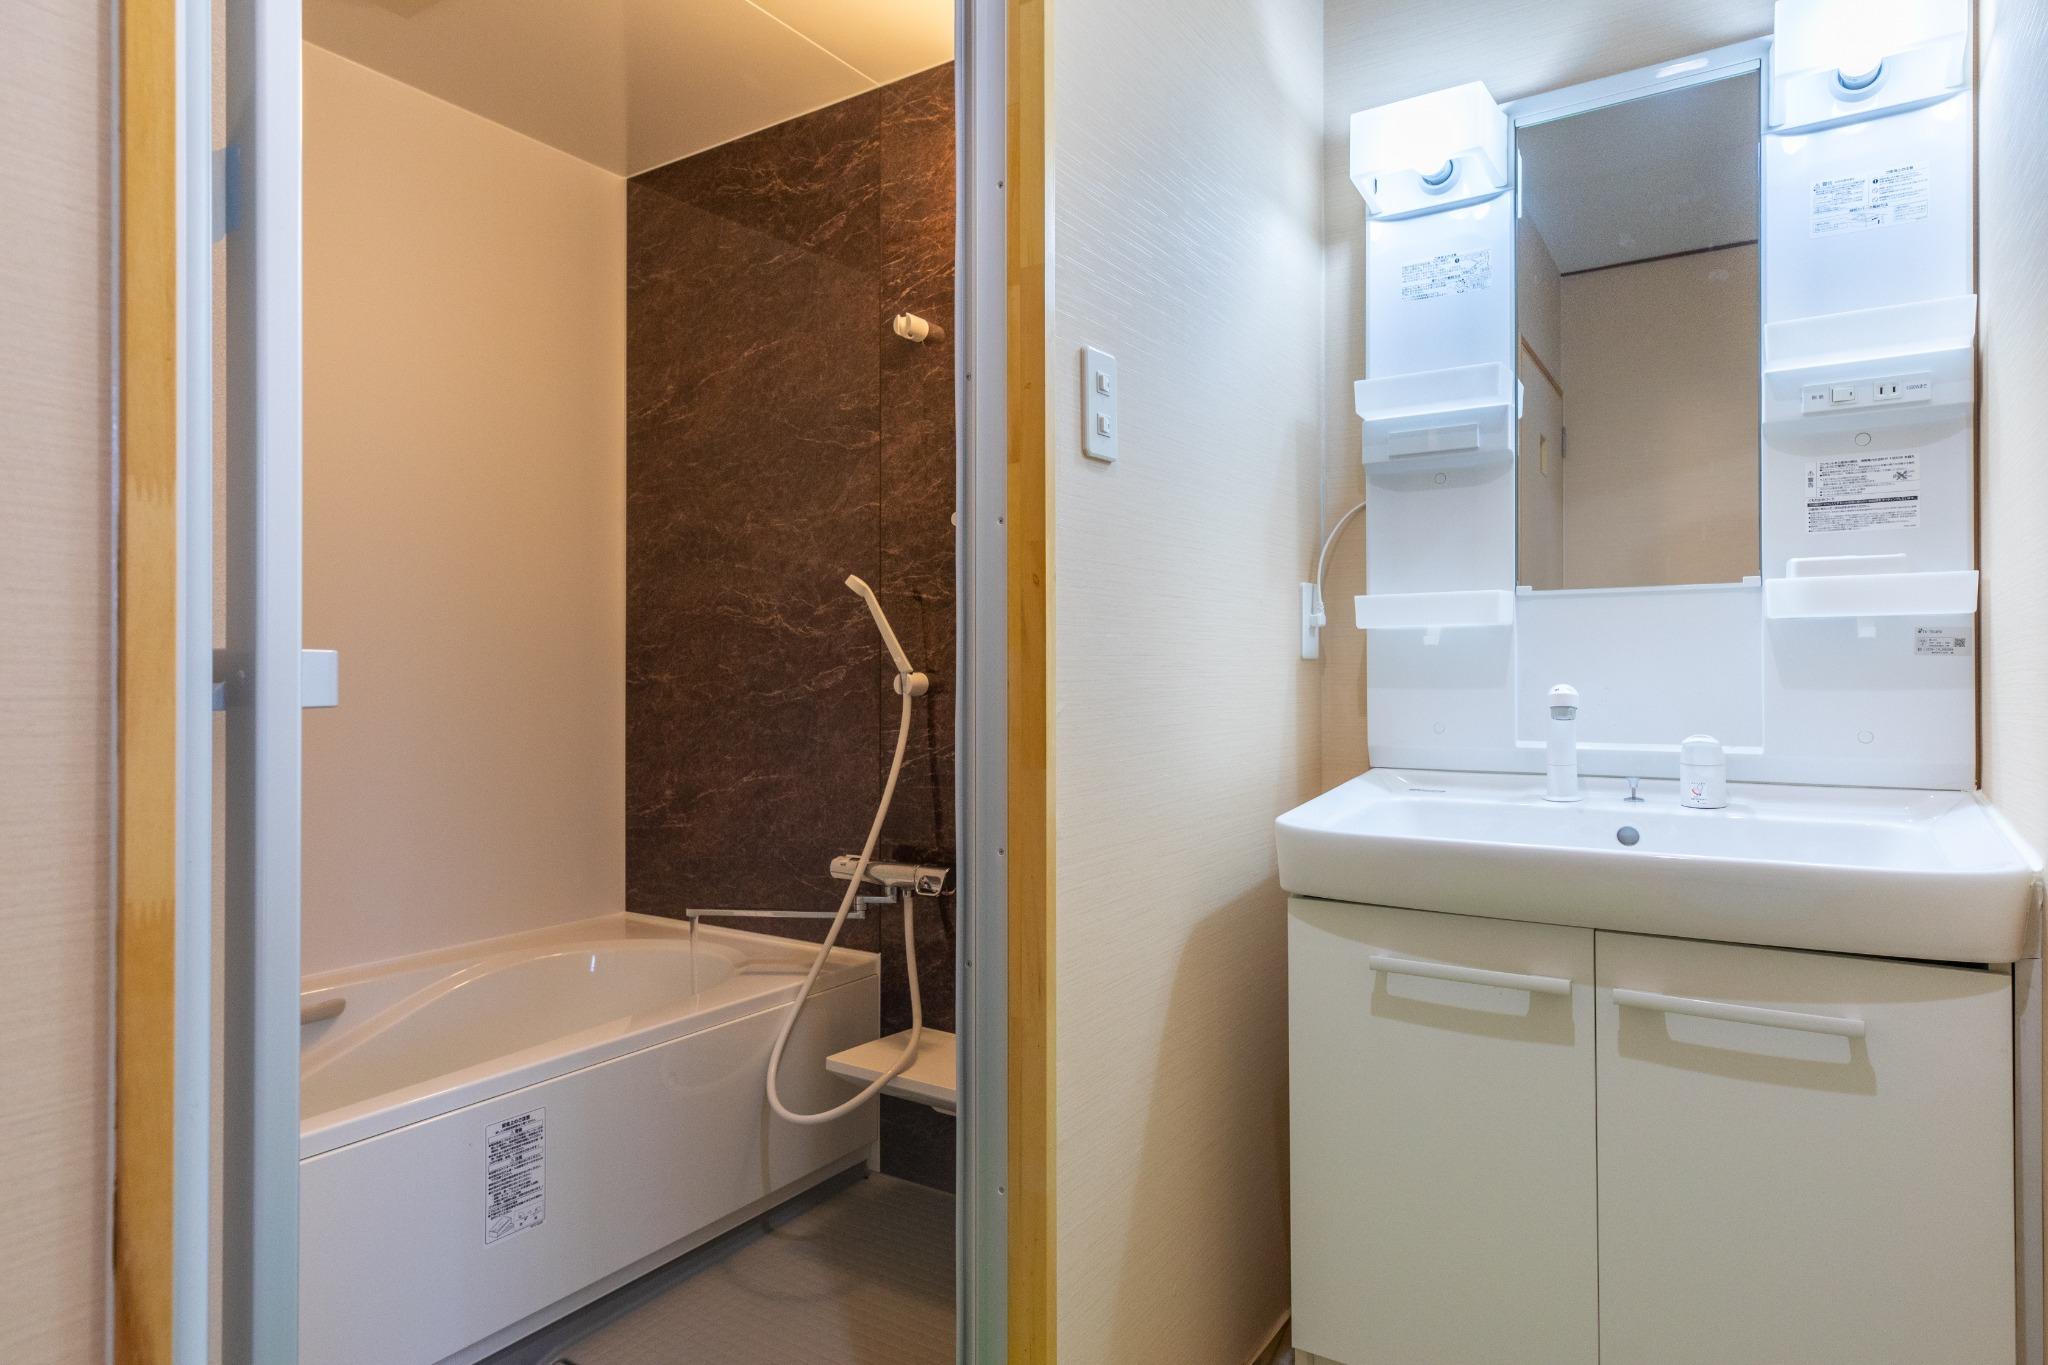 Bedroom 03 Washroom 寝室03 洗面所